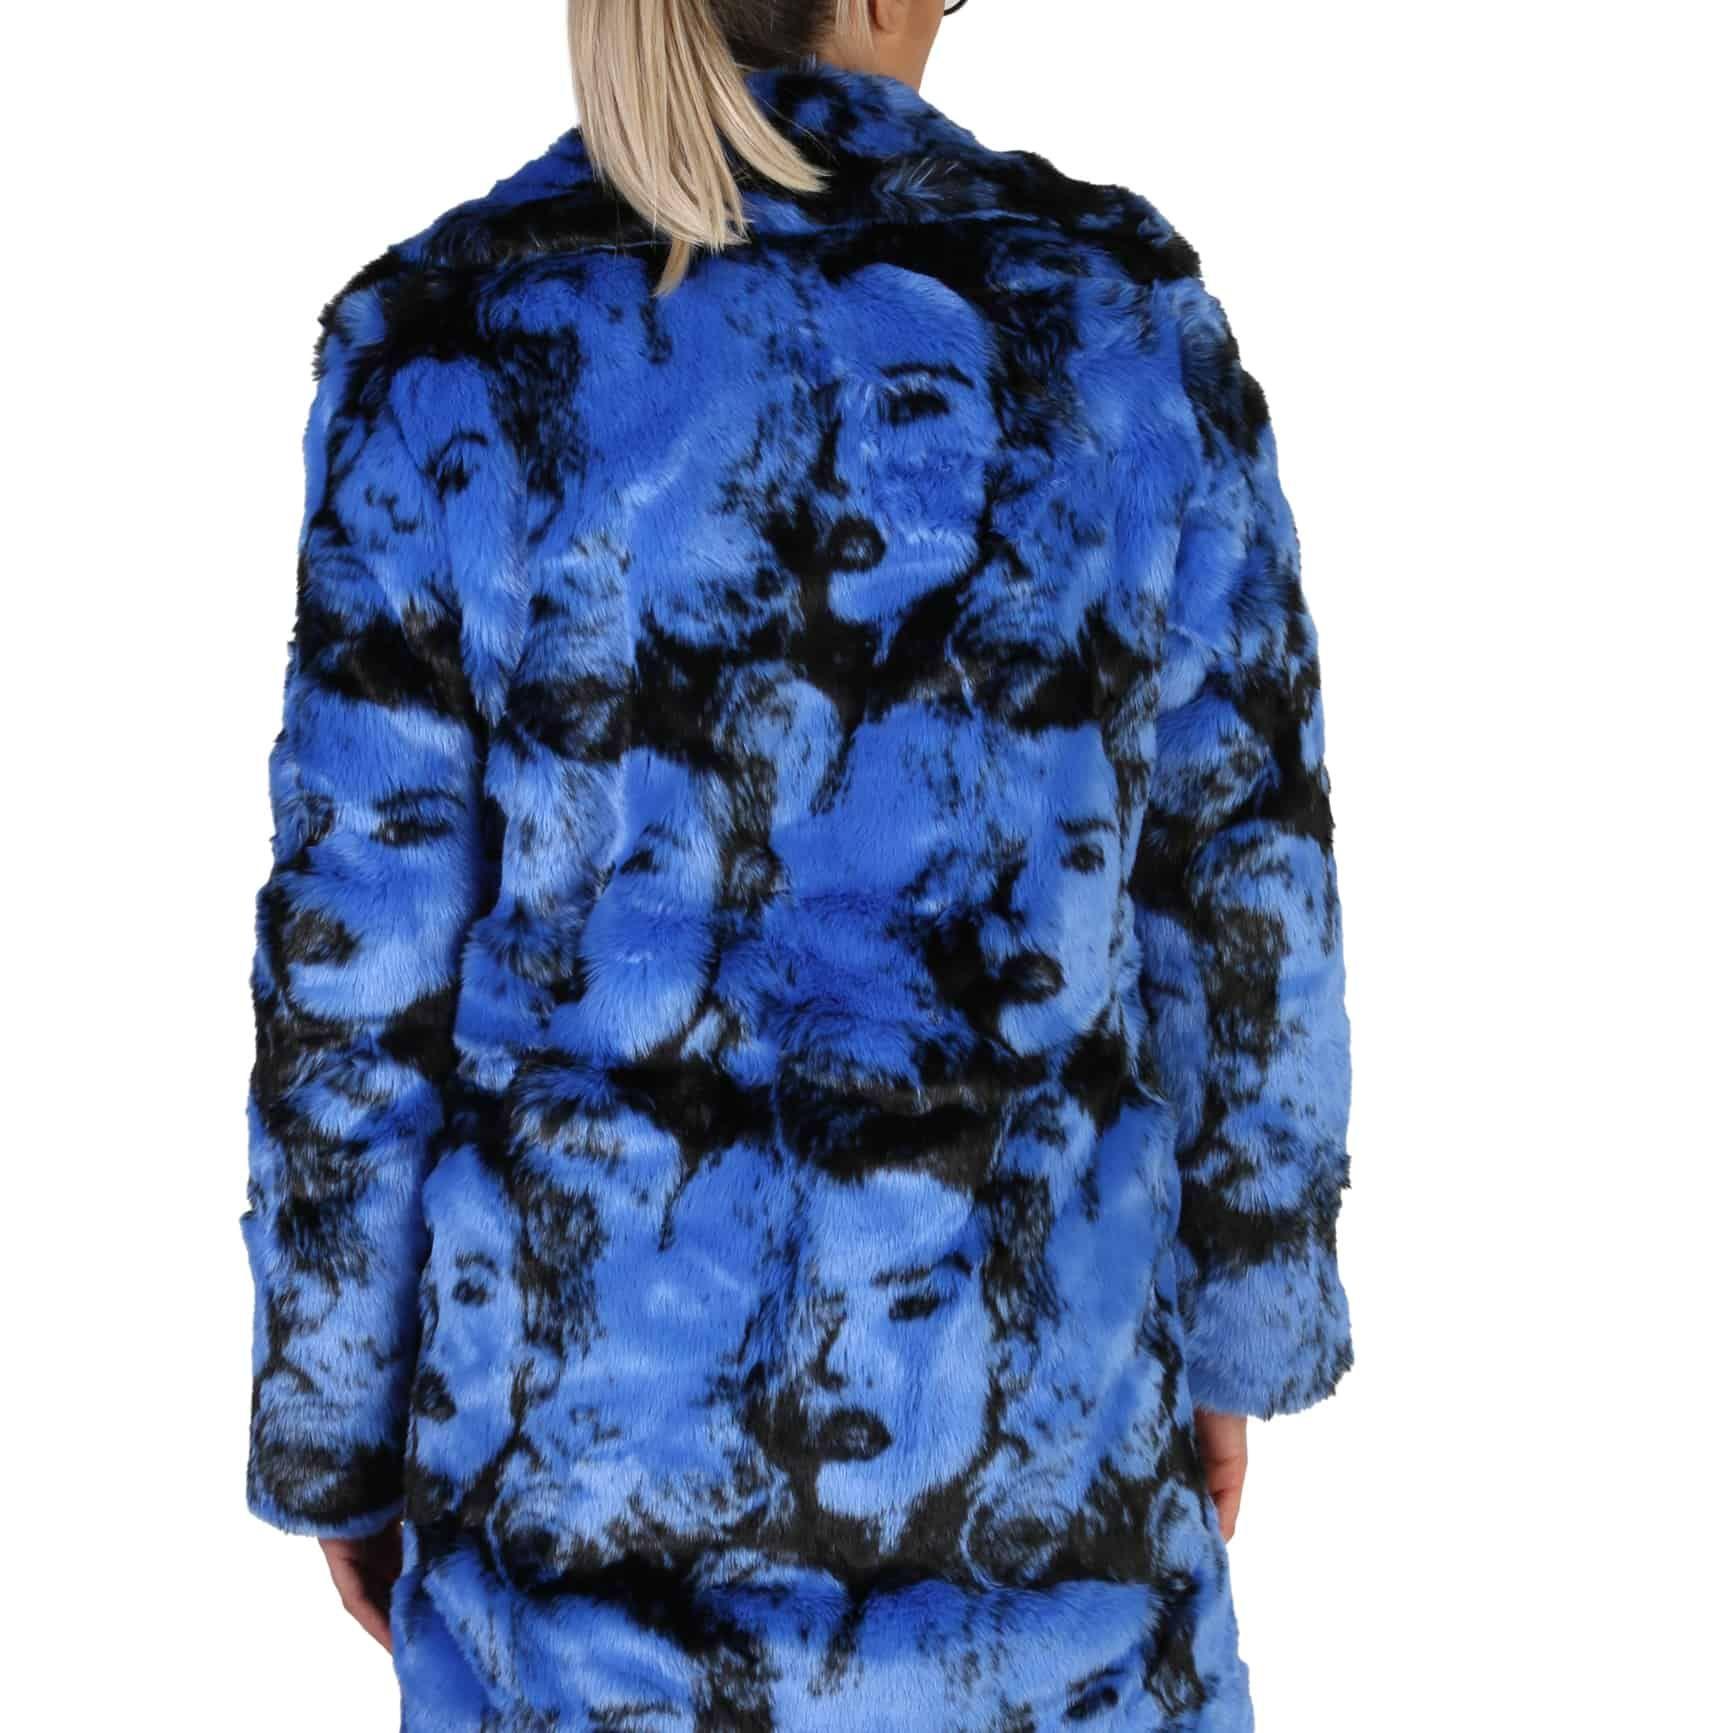 Bekleidung Guess – W84L82 – Blau